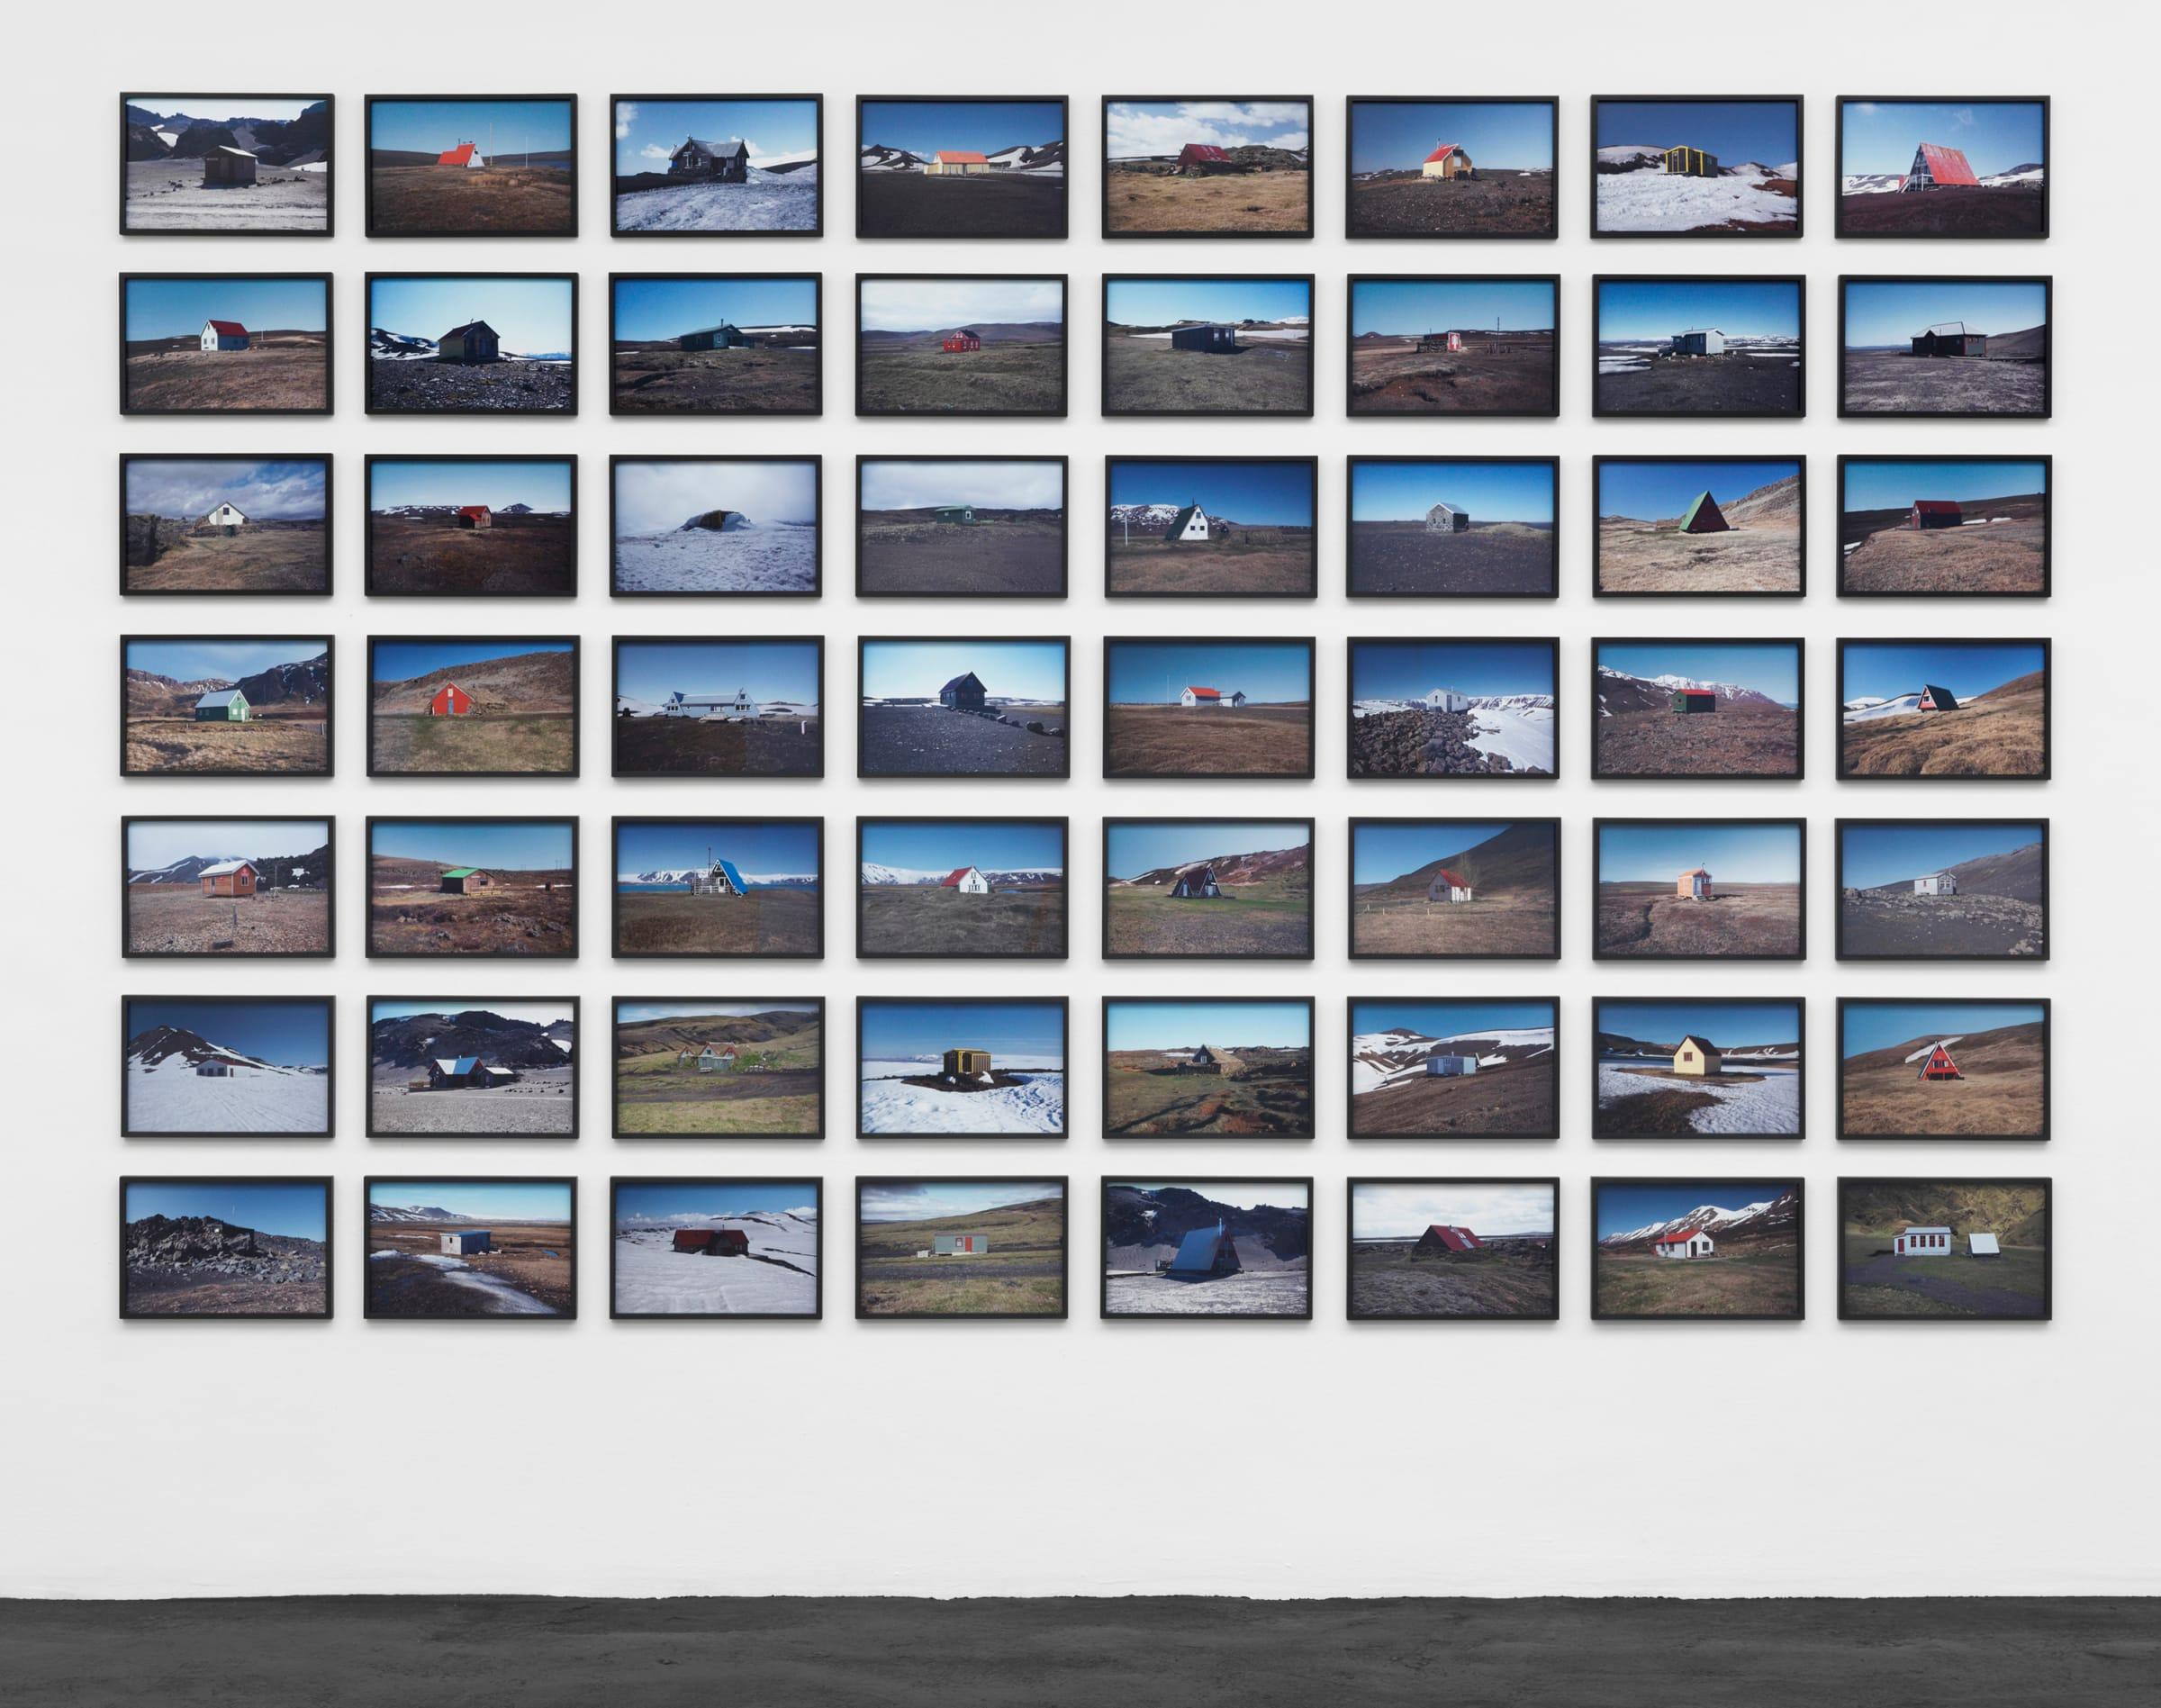 "<span class=""link fancybox-details-link""><a href=""/exhibitions/132/works/artworks9329/"">View Detail Page</a></span><div class=""artist""><strong>ÓLAFUR ELÍASSON</strong></div><div class=""title""><em>The hut series</em>, 2012</div><div class=""medium"">56 c-prints</div><div class=""dimensions"">each print: 25 x 38 cm <br>framed:26,4 x 39,4 x 2,2 cm<br>Installed: 226,8 x 357,2 cm</div><div class=""edition_details""></div>"